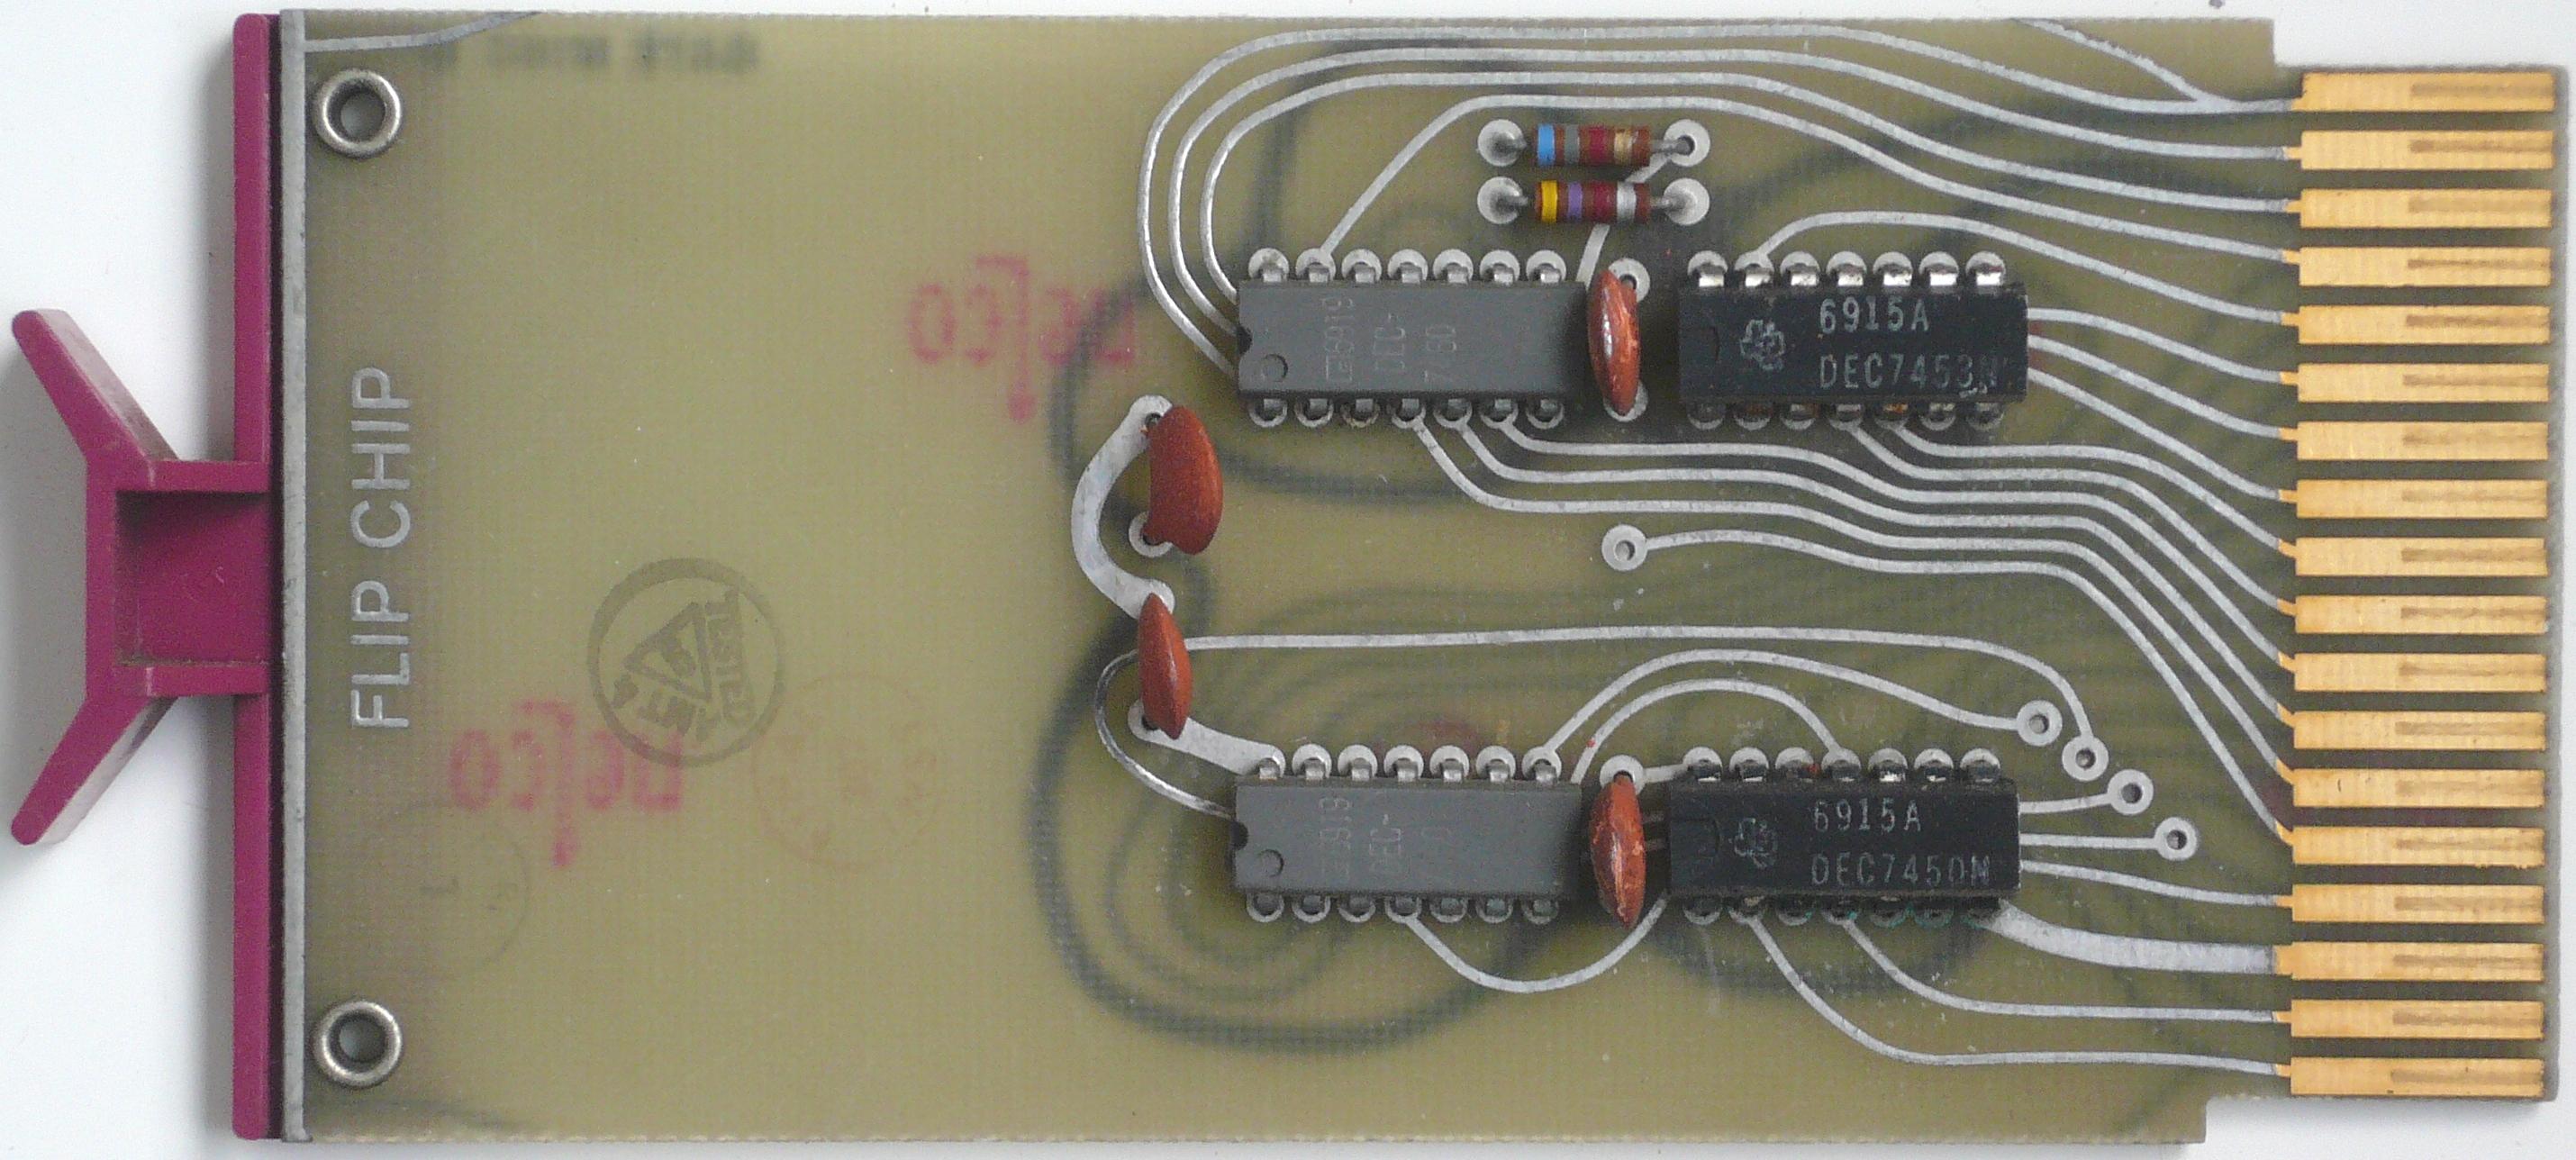 Decmodule M001 M499 Binarytobcd Converter Module Digital Dec Modul M160and Nor Gate 1803349 Byte